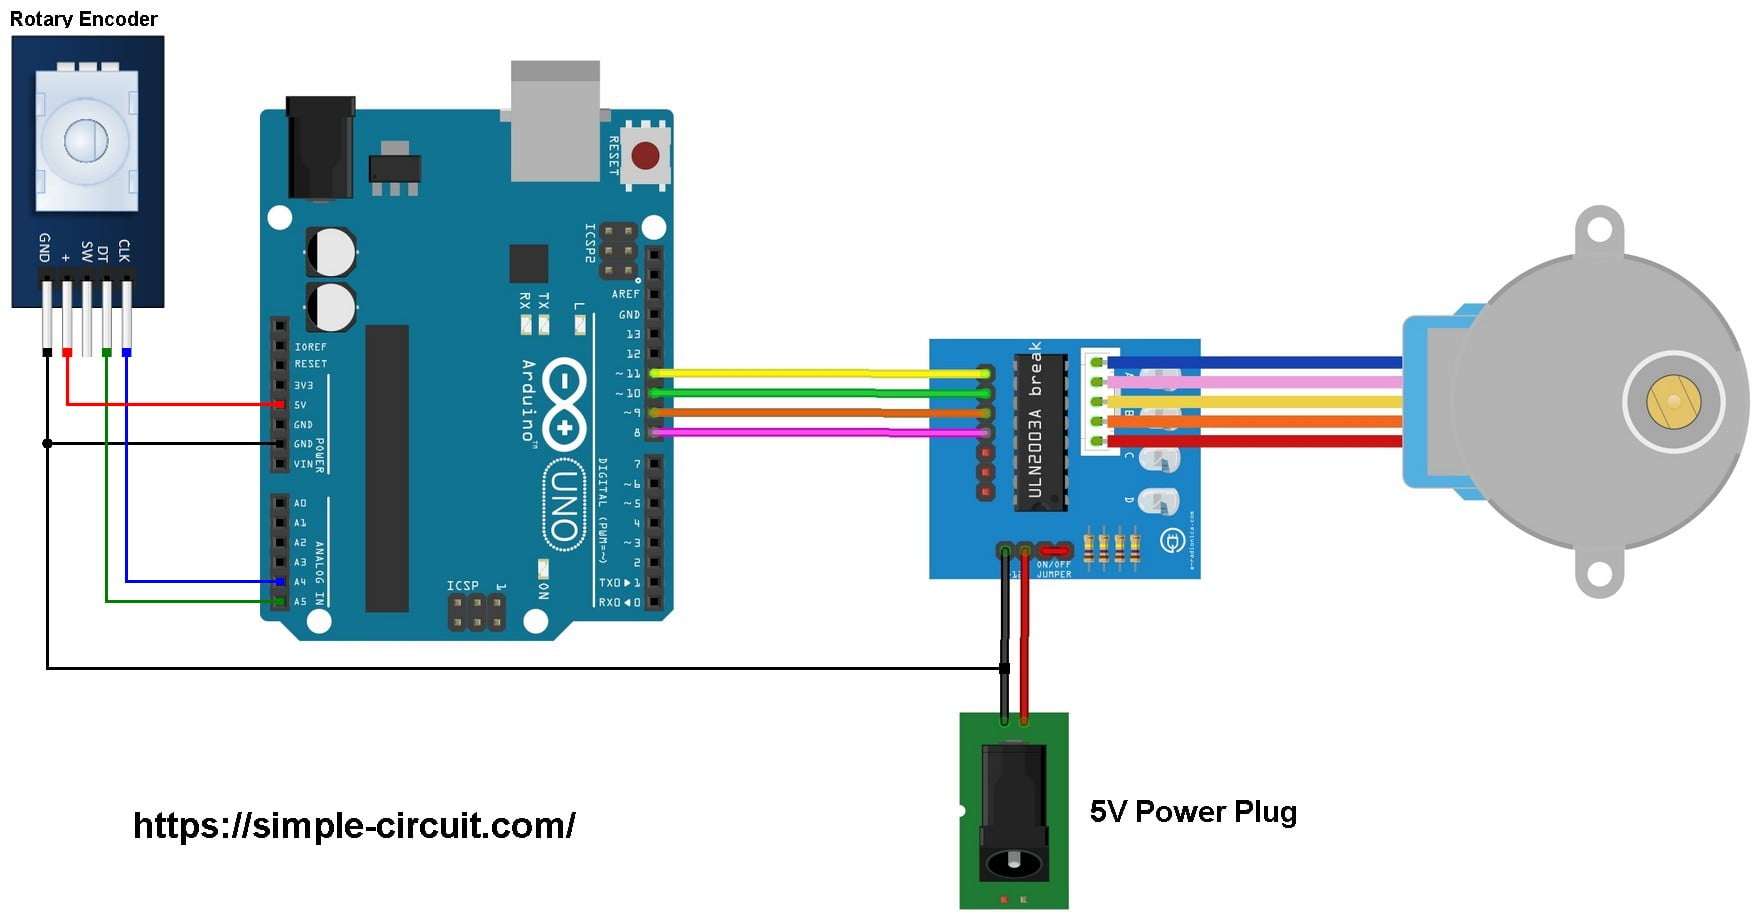 Arduino Stepper Motor Control With Rotary Encoder